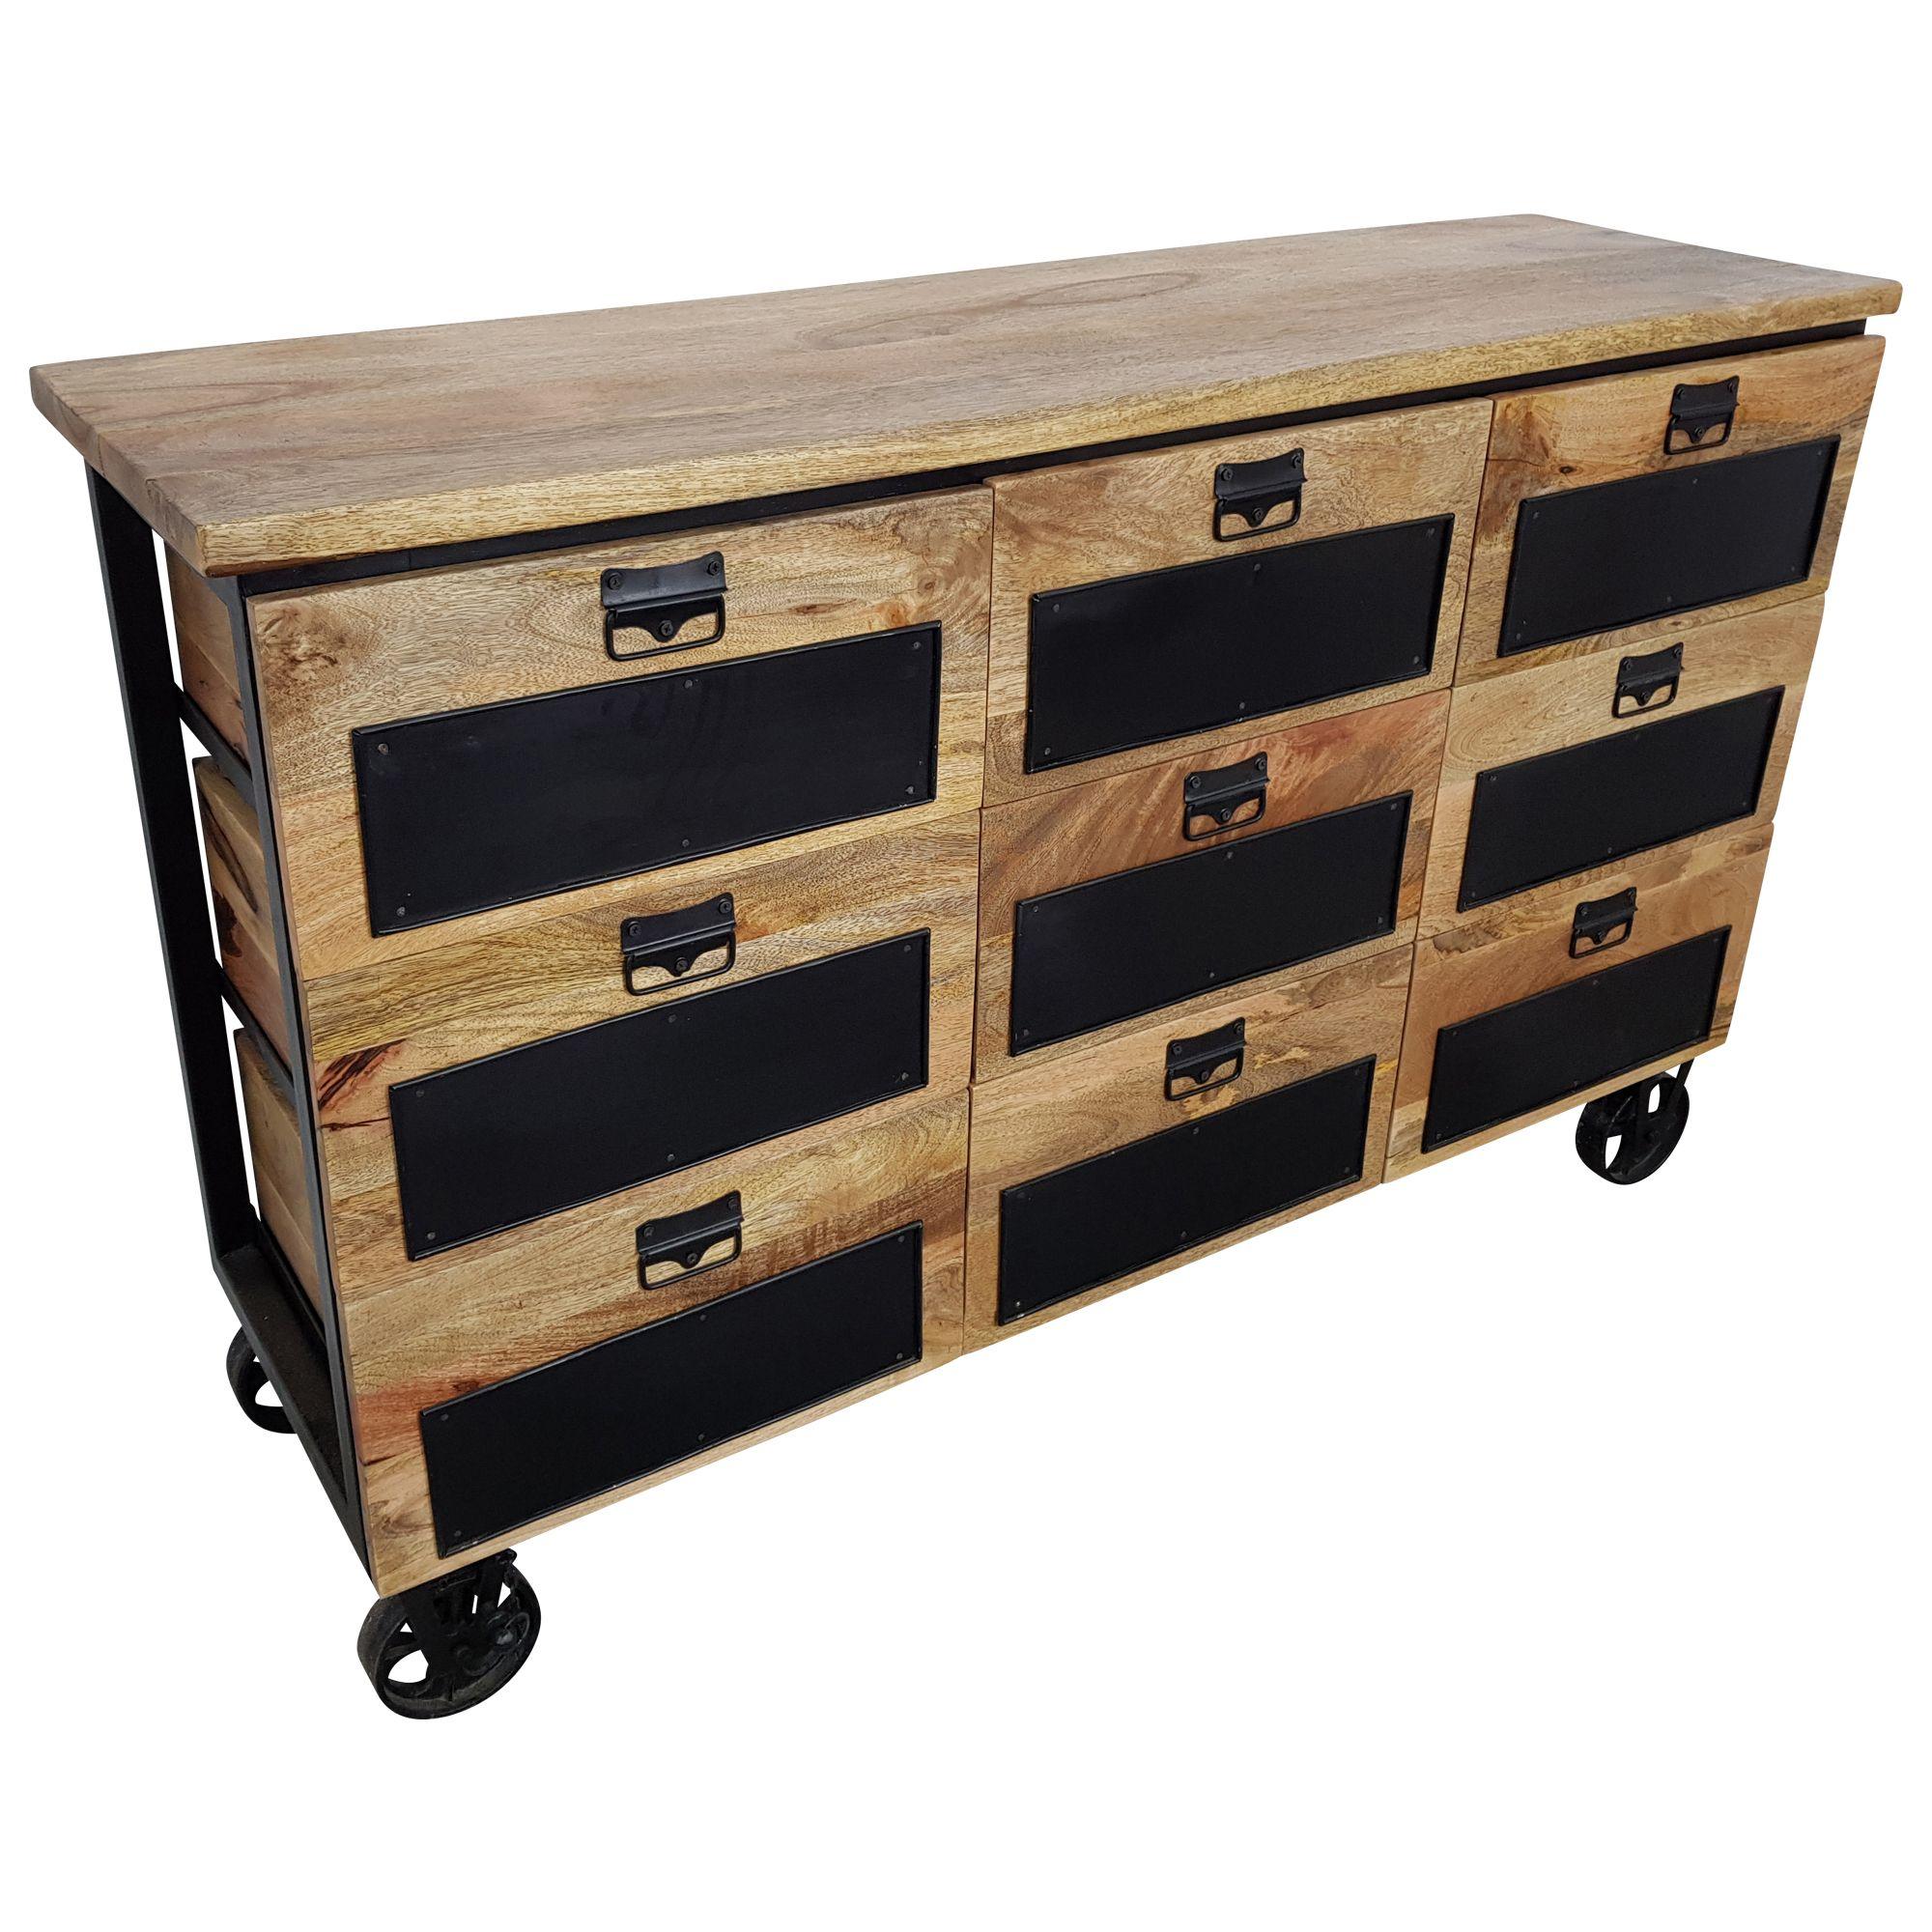 Kommode Schrank Sideboard Rader Rollbar Massiv Holz Apotheker